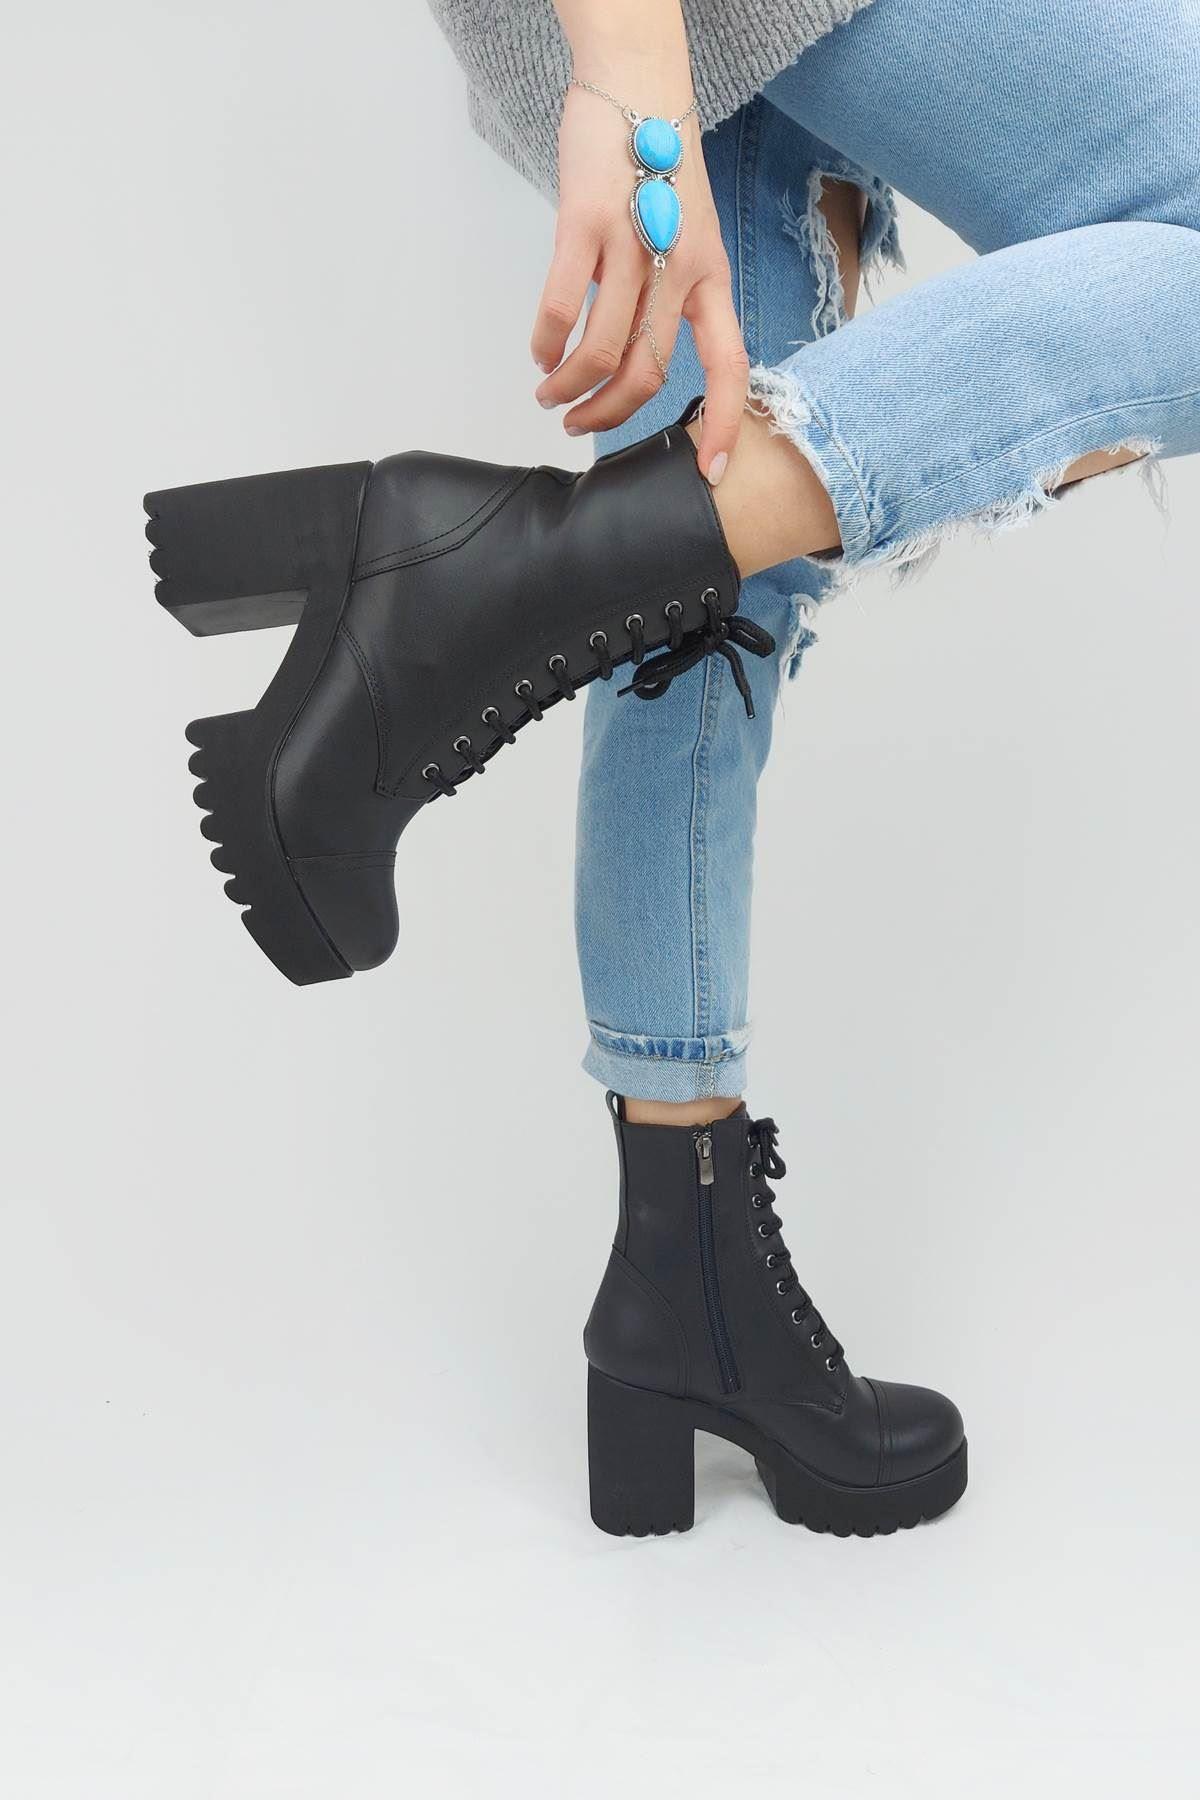 Yessie Siyah Cilt Bağcık Detaylı Topuklu Bot - kopya